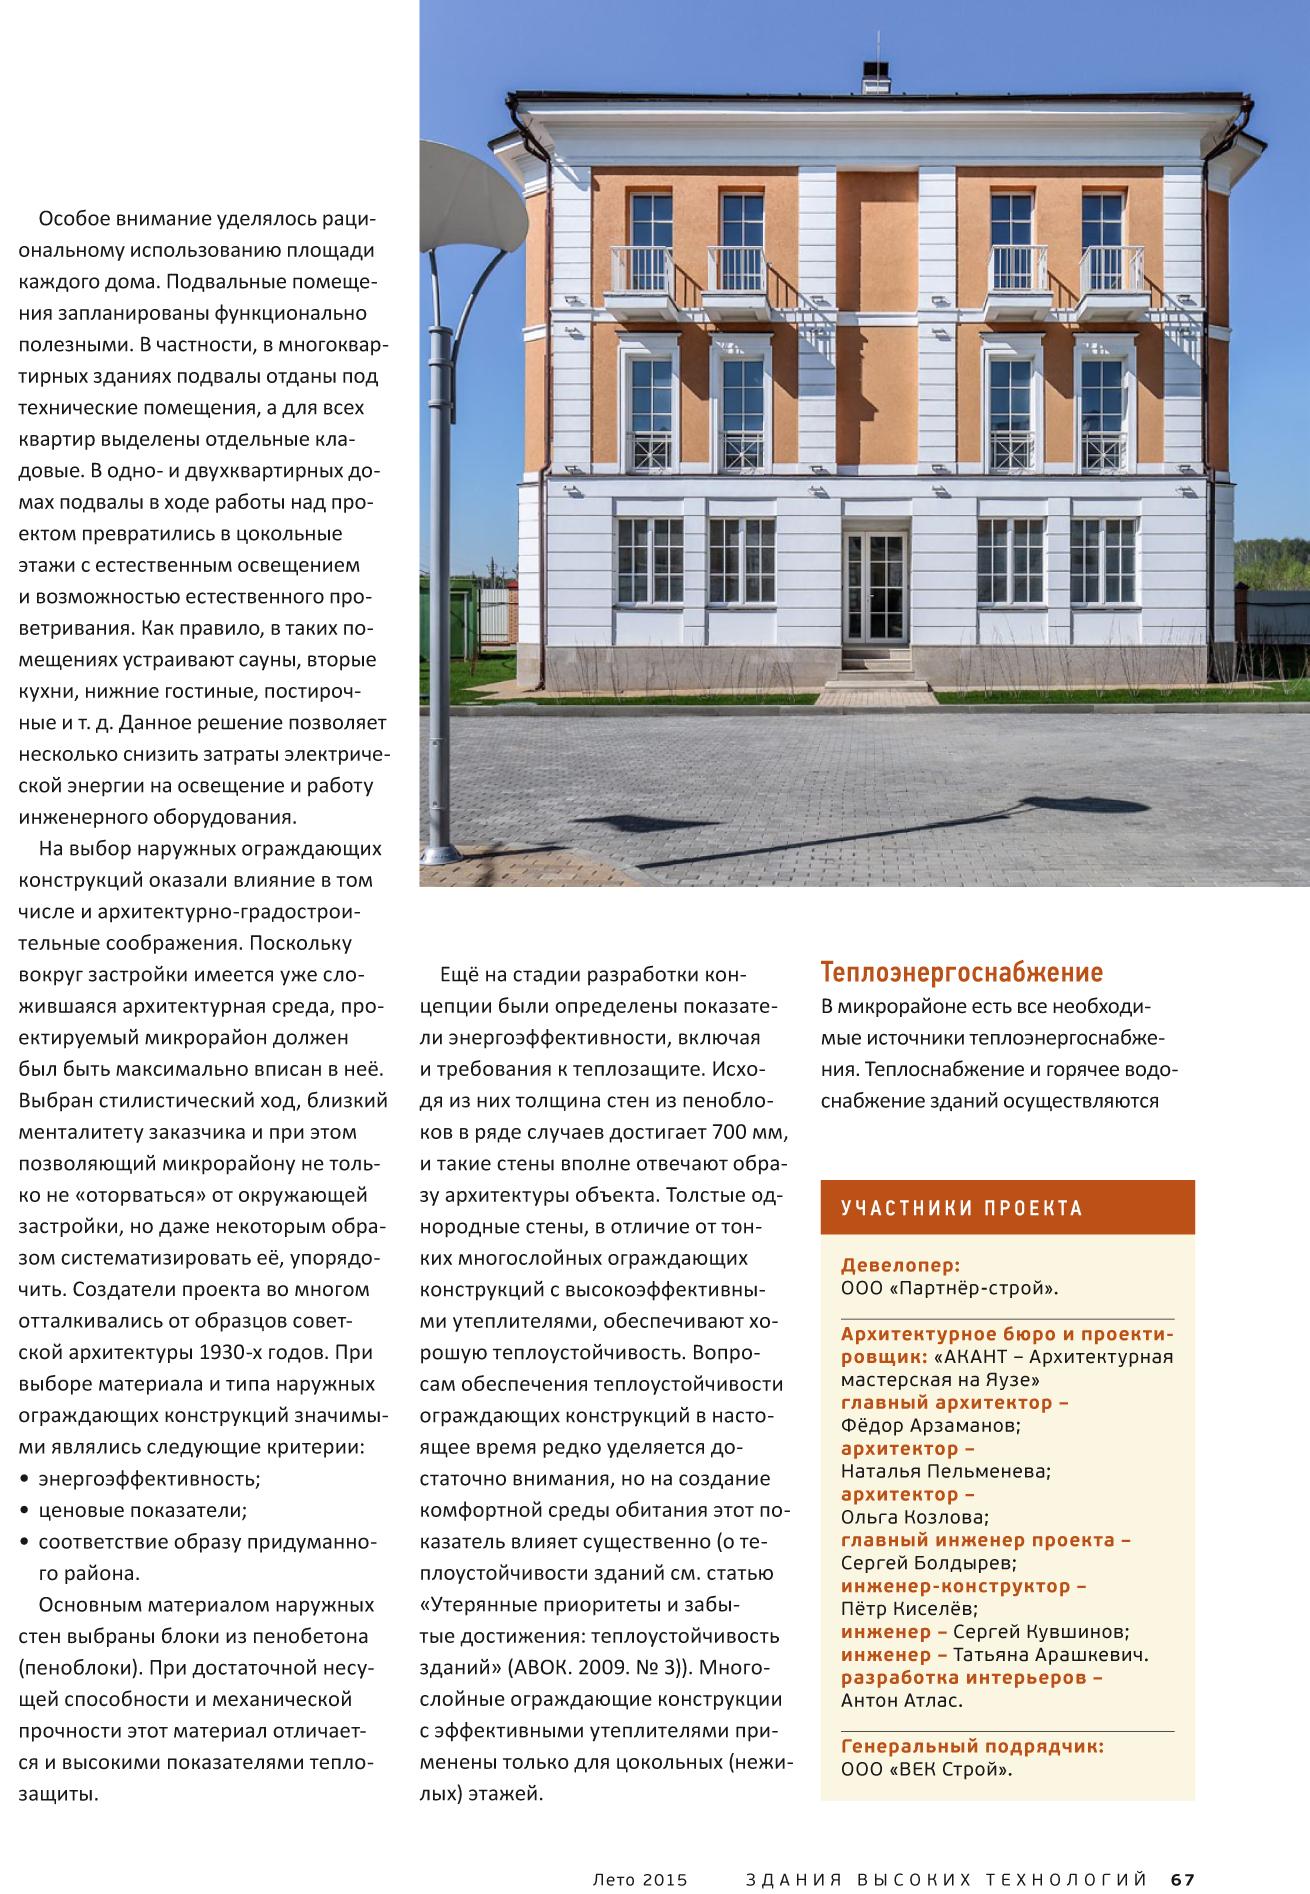 ЗВТ лето 2015 (Дудкино)-6.jpg